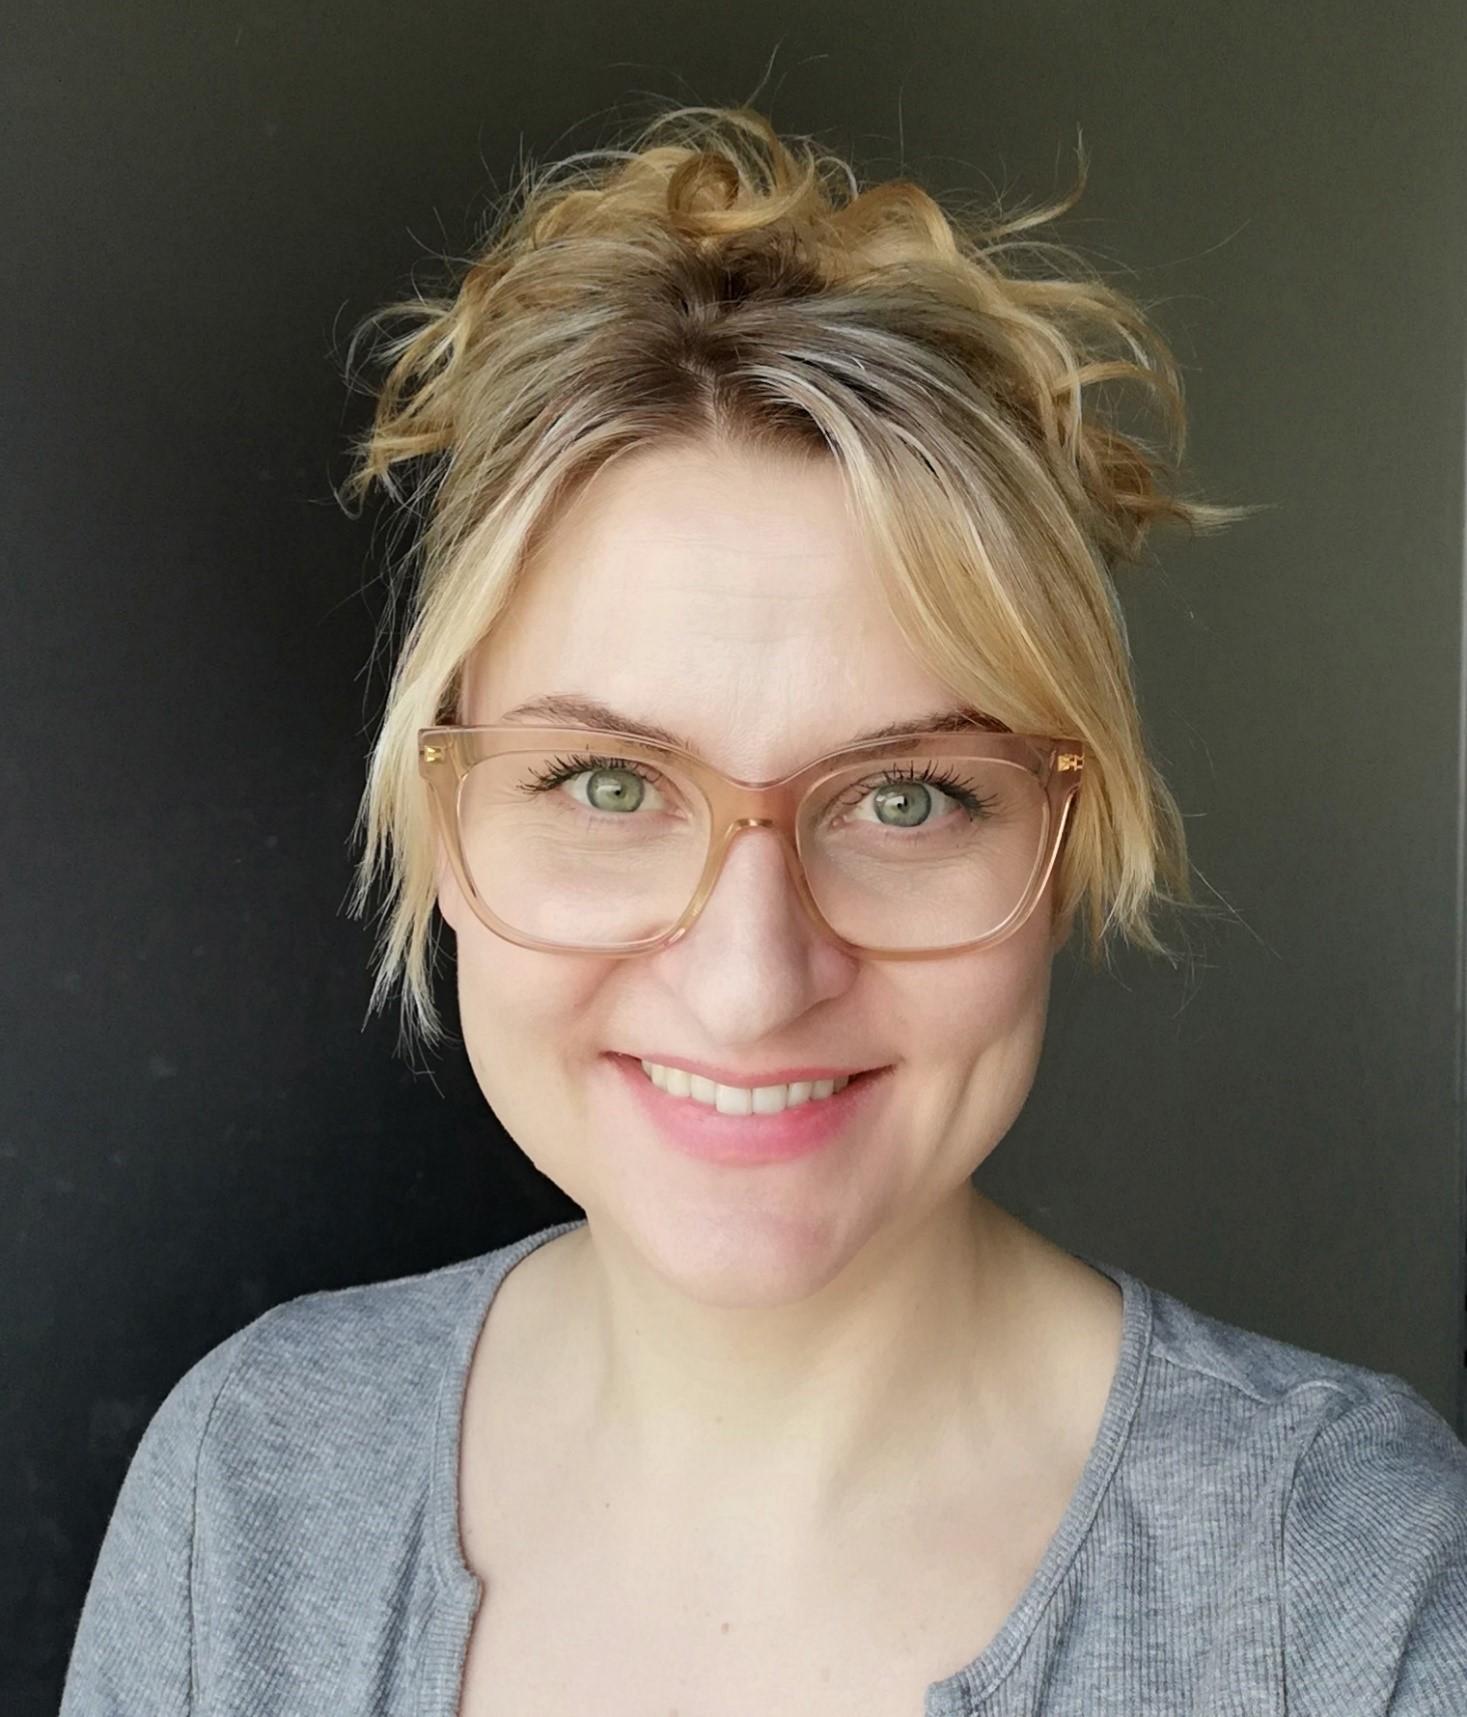 Psykolog Julie Aasbjerg Andersen